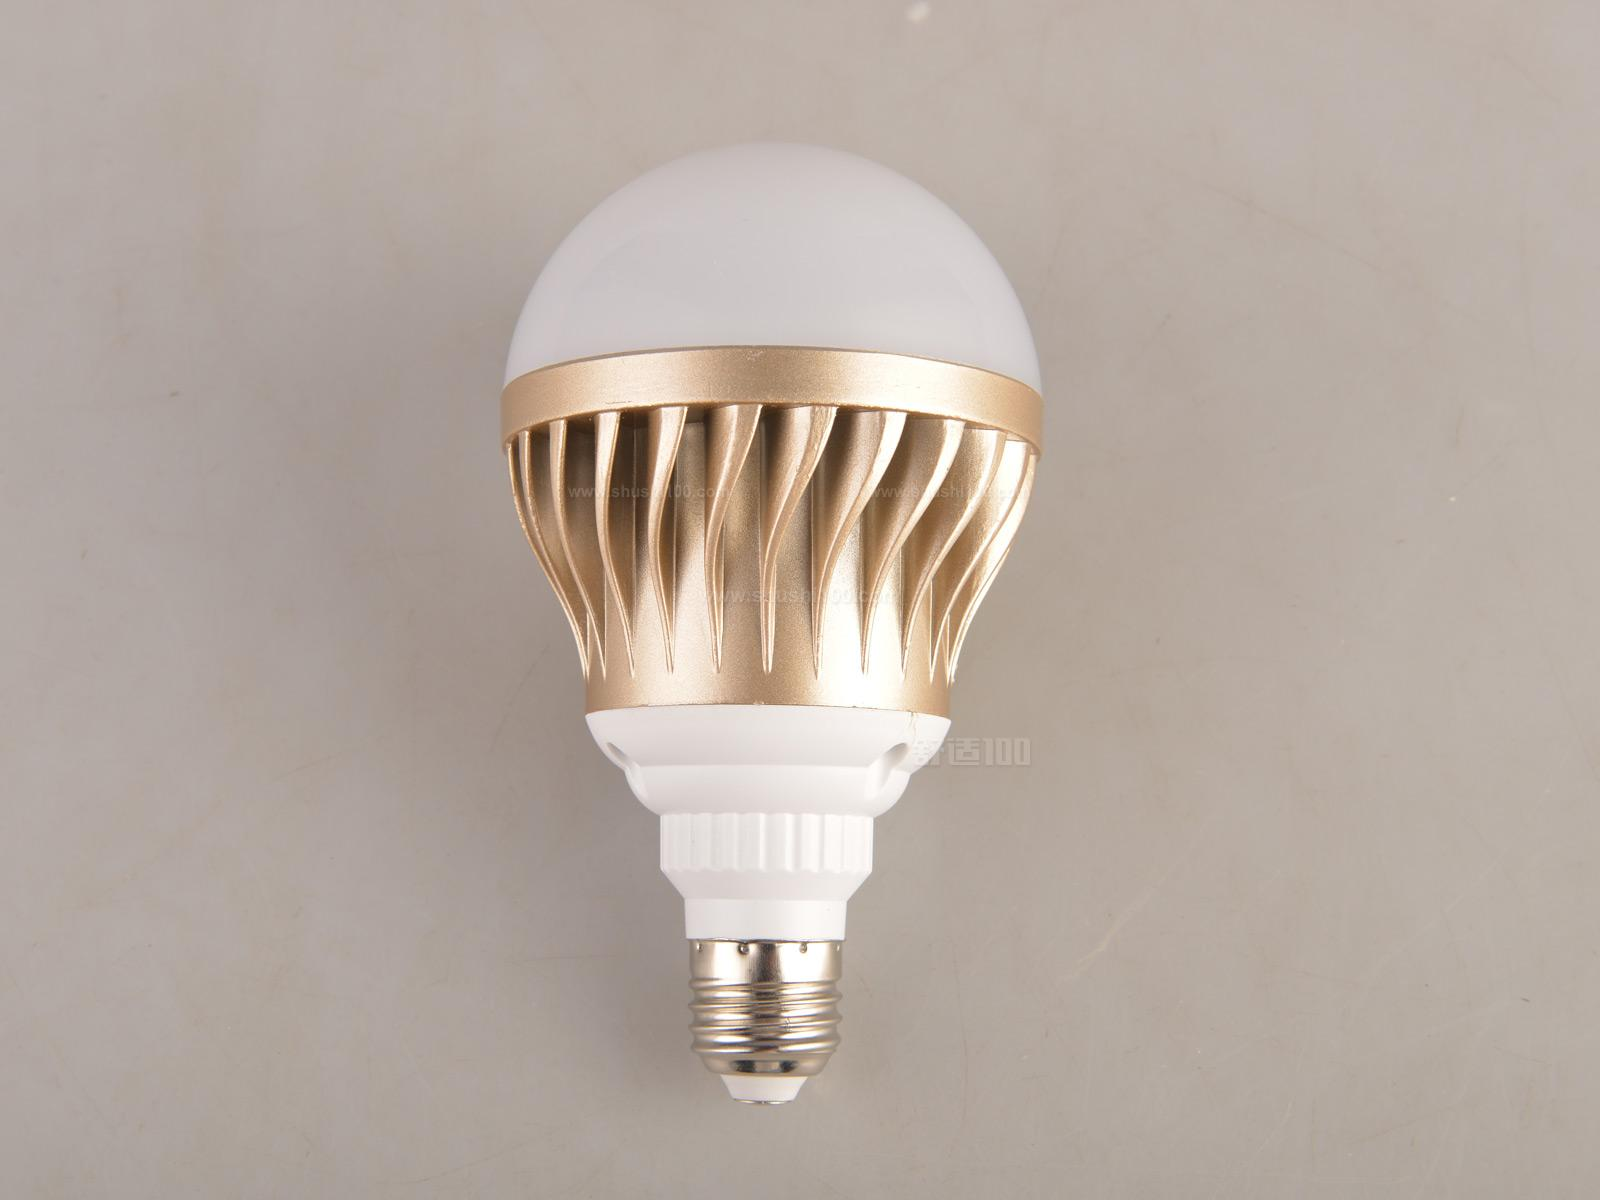 led照明灯报价